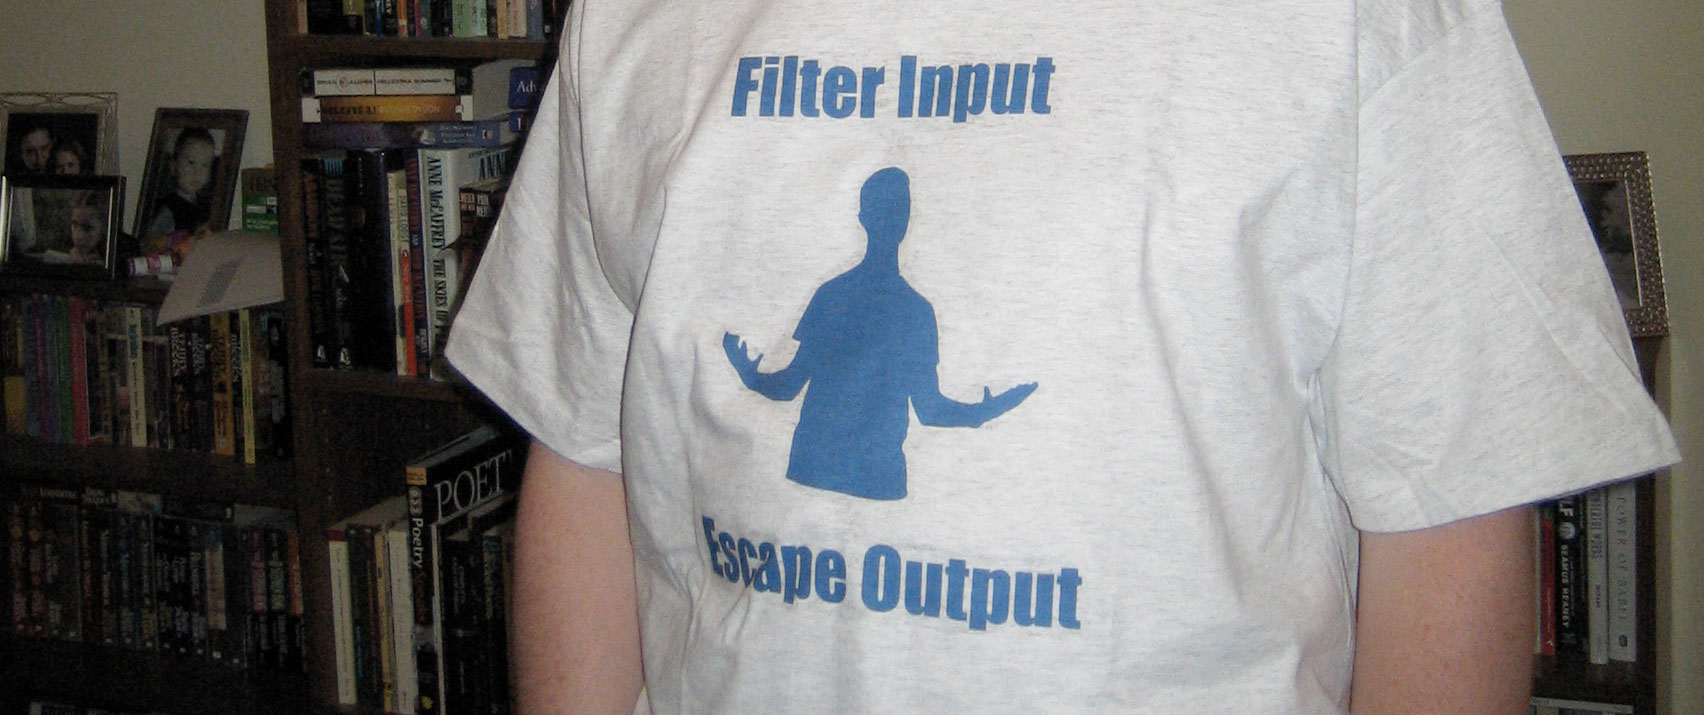 "A photograph of me wearing a ""Filter Input, Escape Output"" t-shirt"